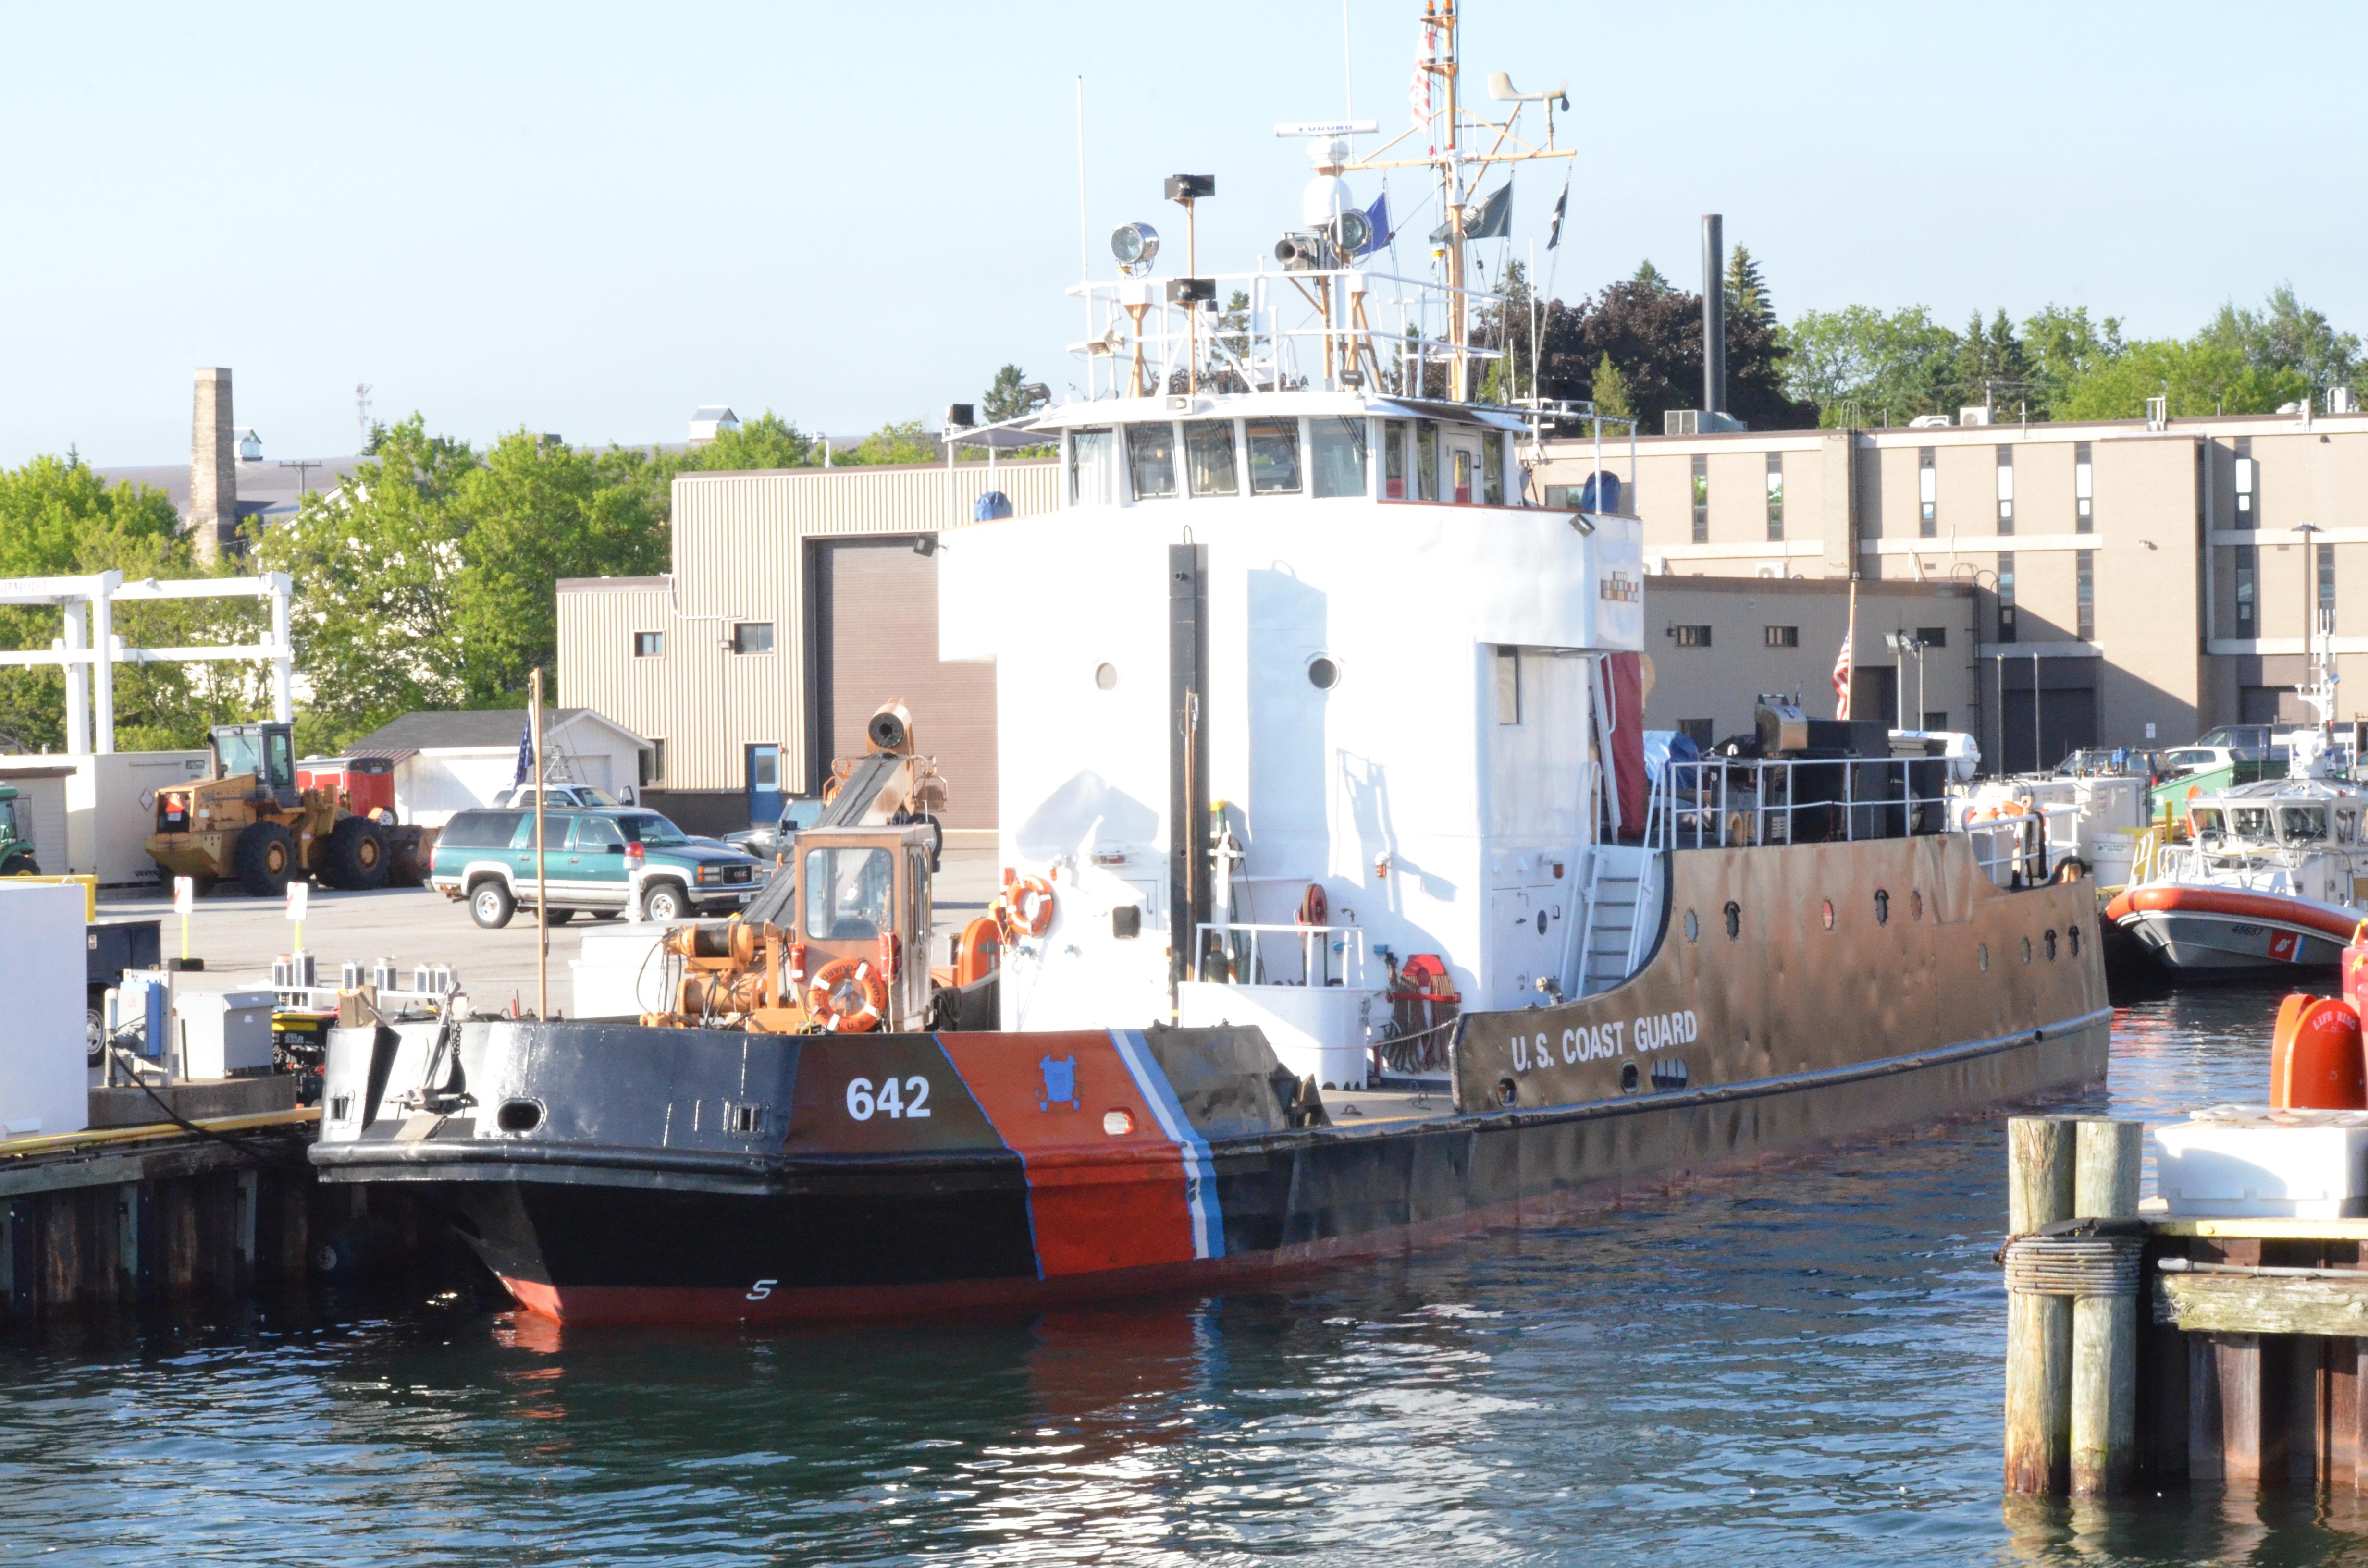 Soo Locks Boat Tours Dock